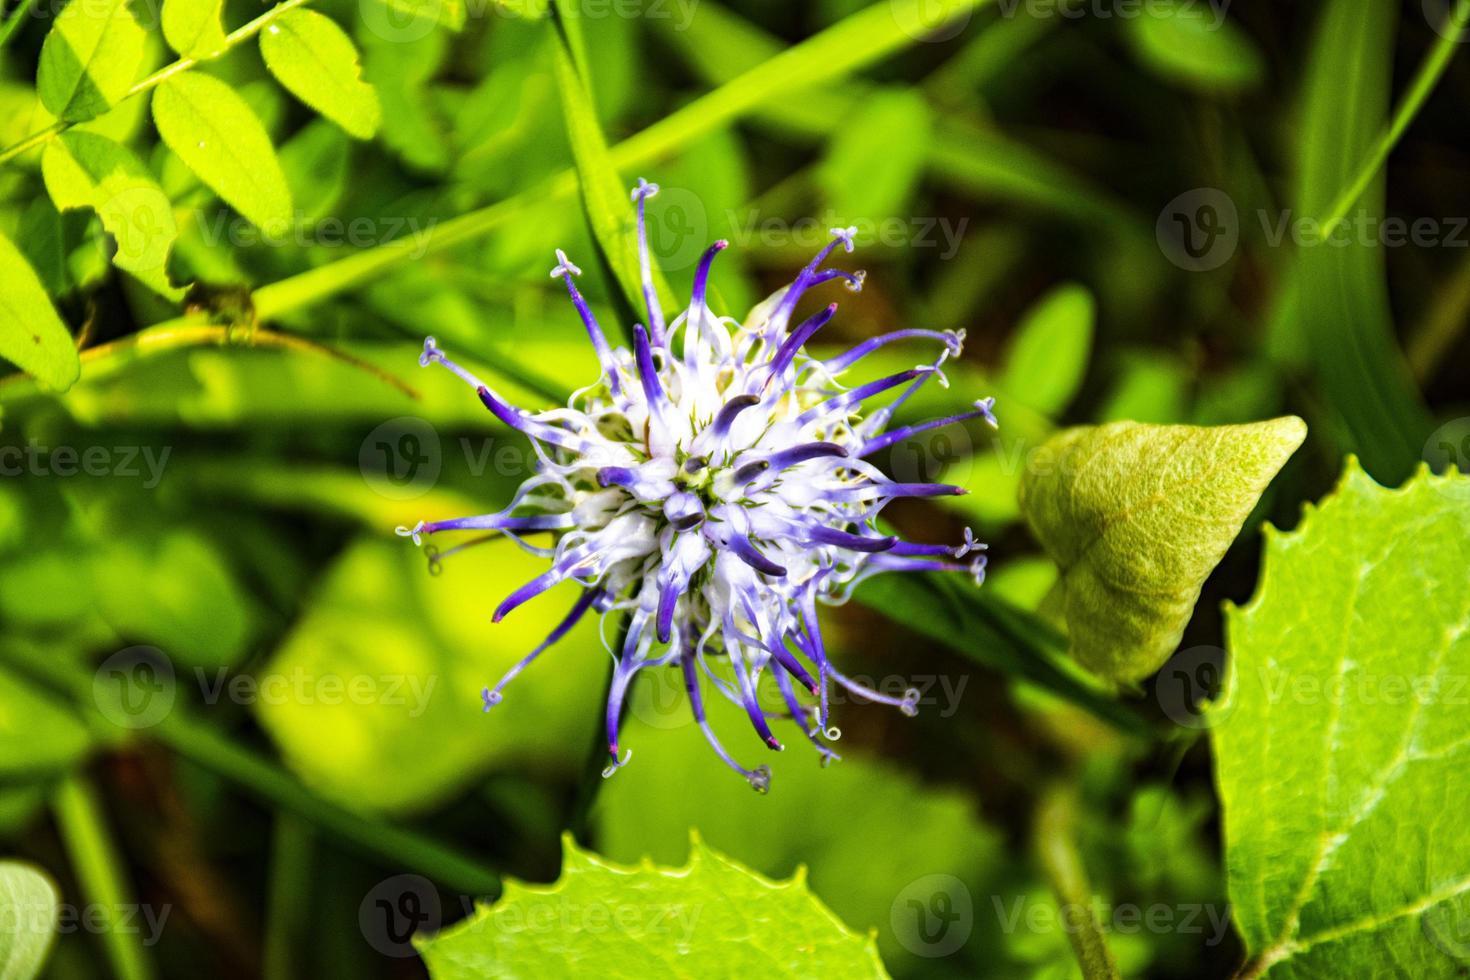 blå raponzolo phyteuma blomma foto